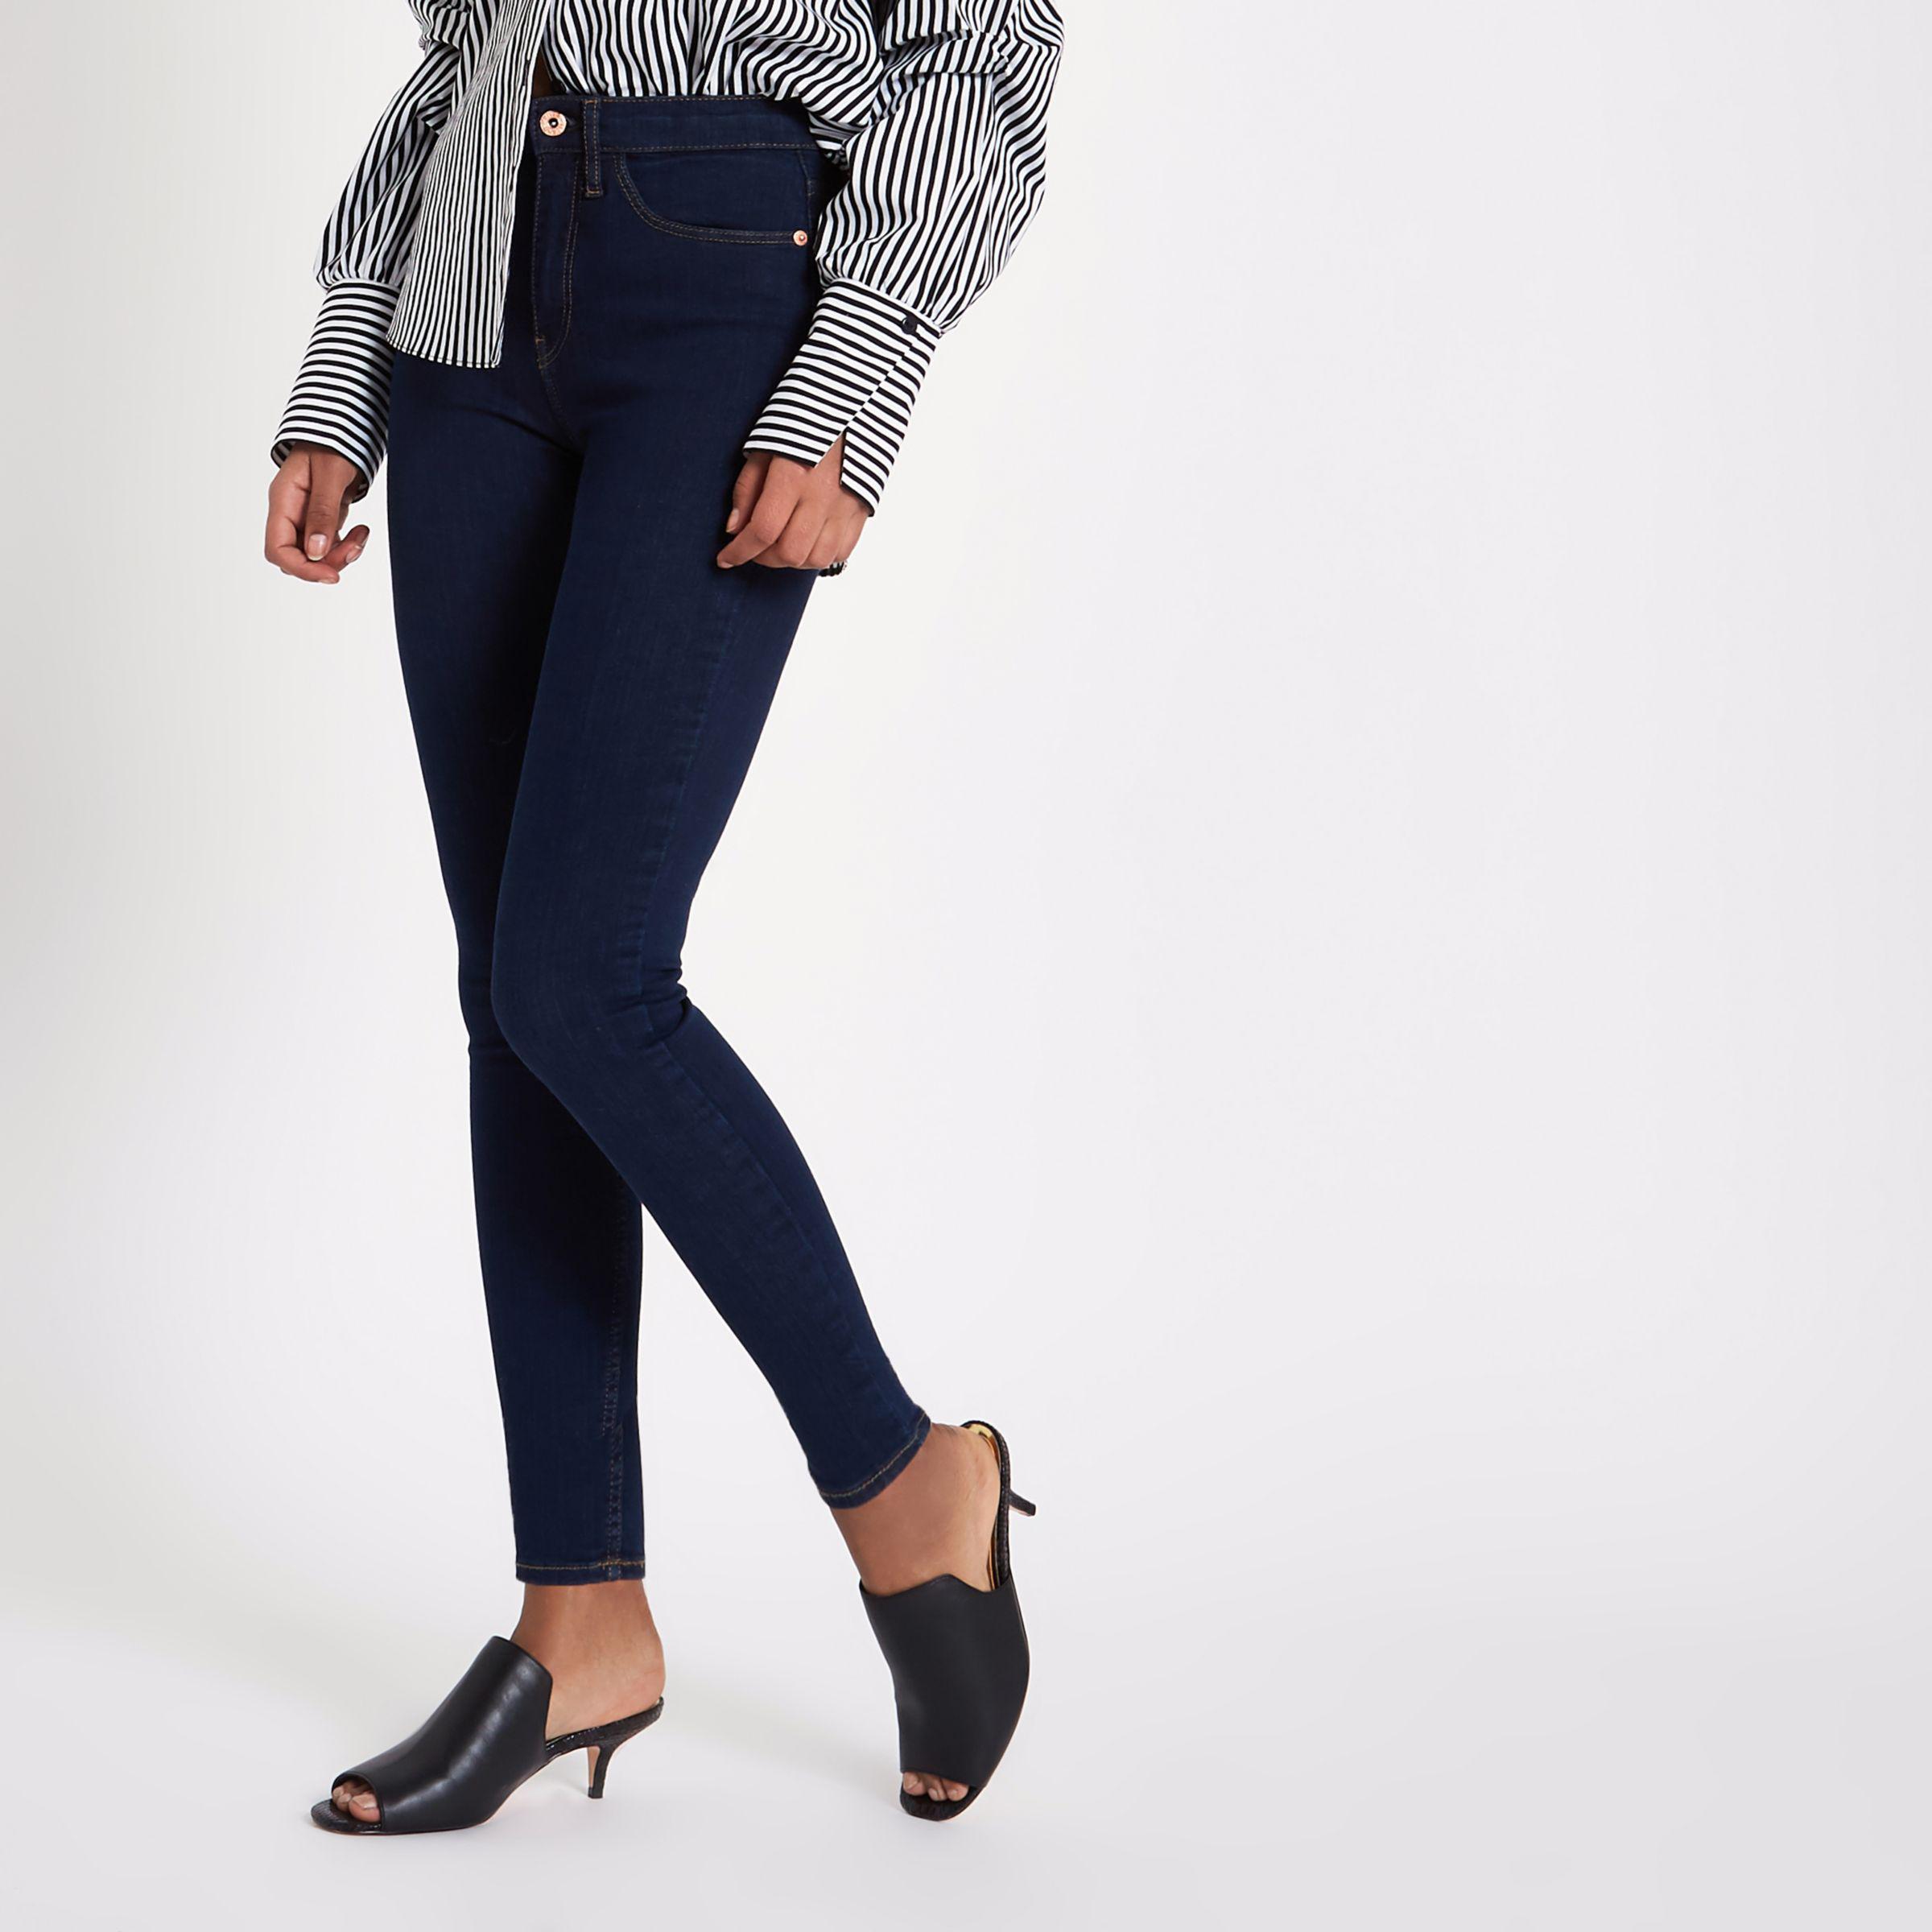 b8046a5bffb0 Lyst - River Island Dark High Waisted Harper Skinny Jeans in Blue